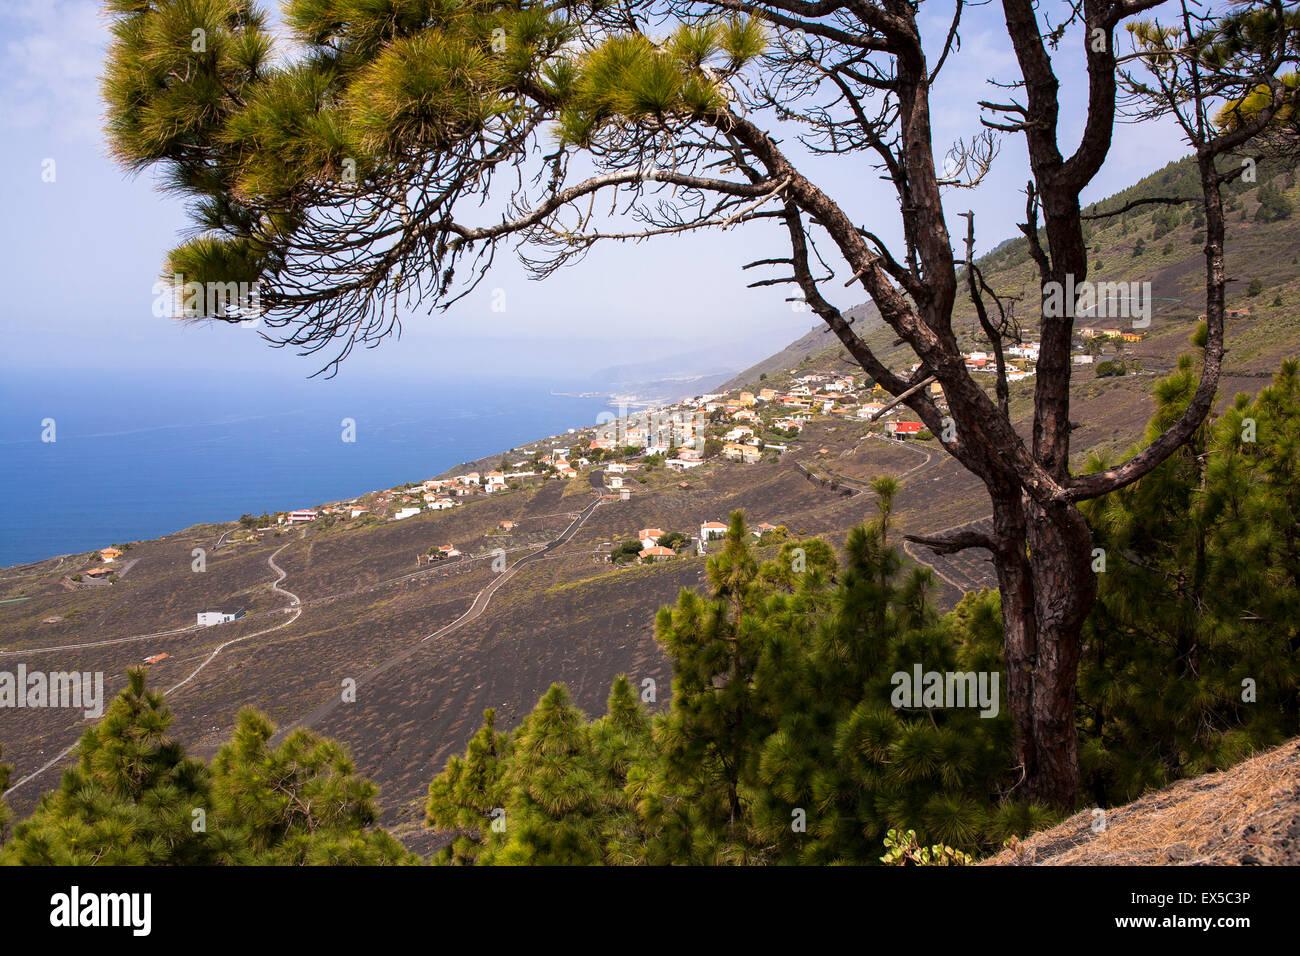 ESP, Spanien, die Kanaren Insel La Palma, Blick auf das Dorf Los Quemados aus dem Vulkan San Antonio.  ESP, Spanien Stockbild